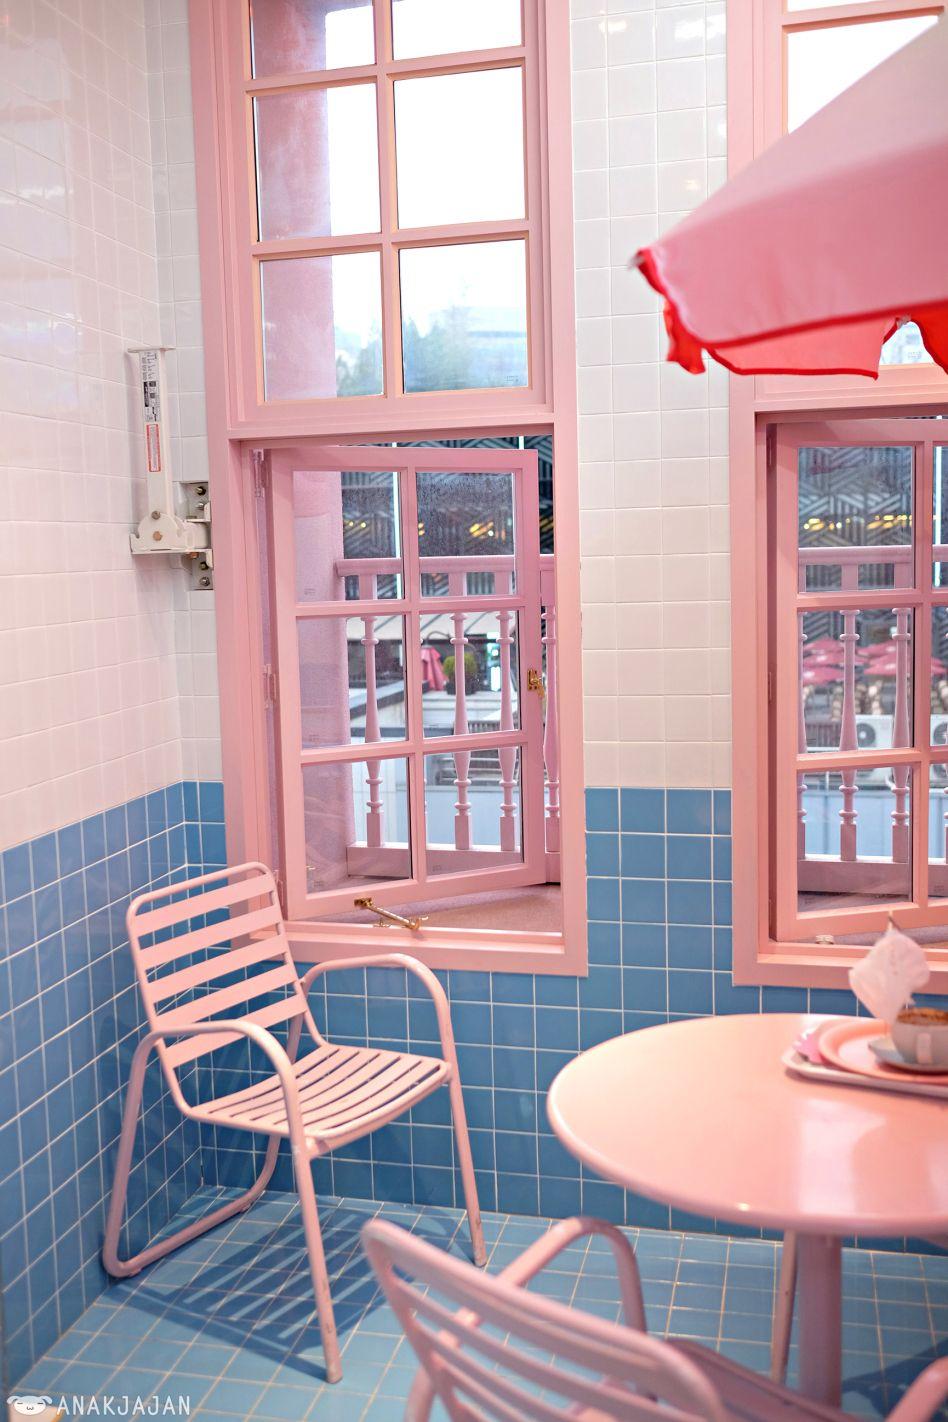 Korea Stylenanda Pink Hotel Pink Pool Cafe Myeongdong Seoul Anakjajan Com Desain Interior Ide Dekorasi Rumah Ide Apartemen